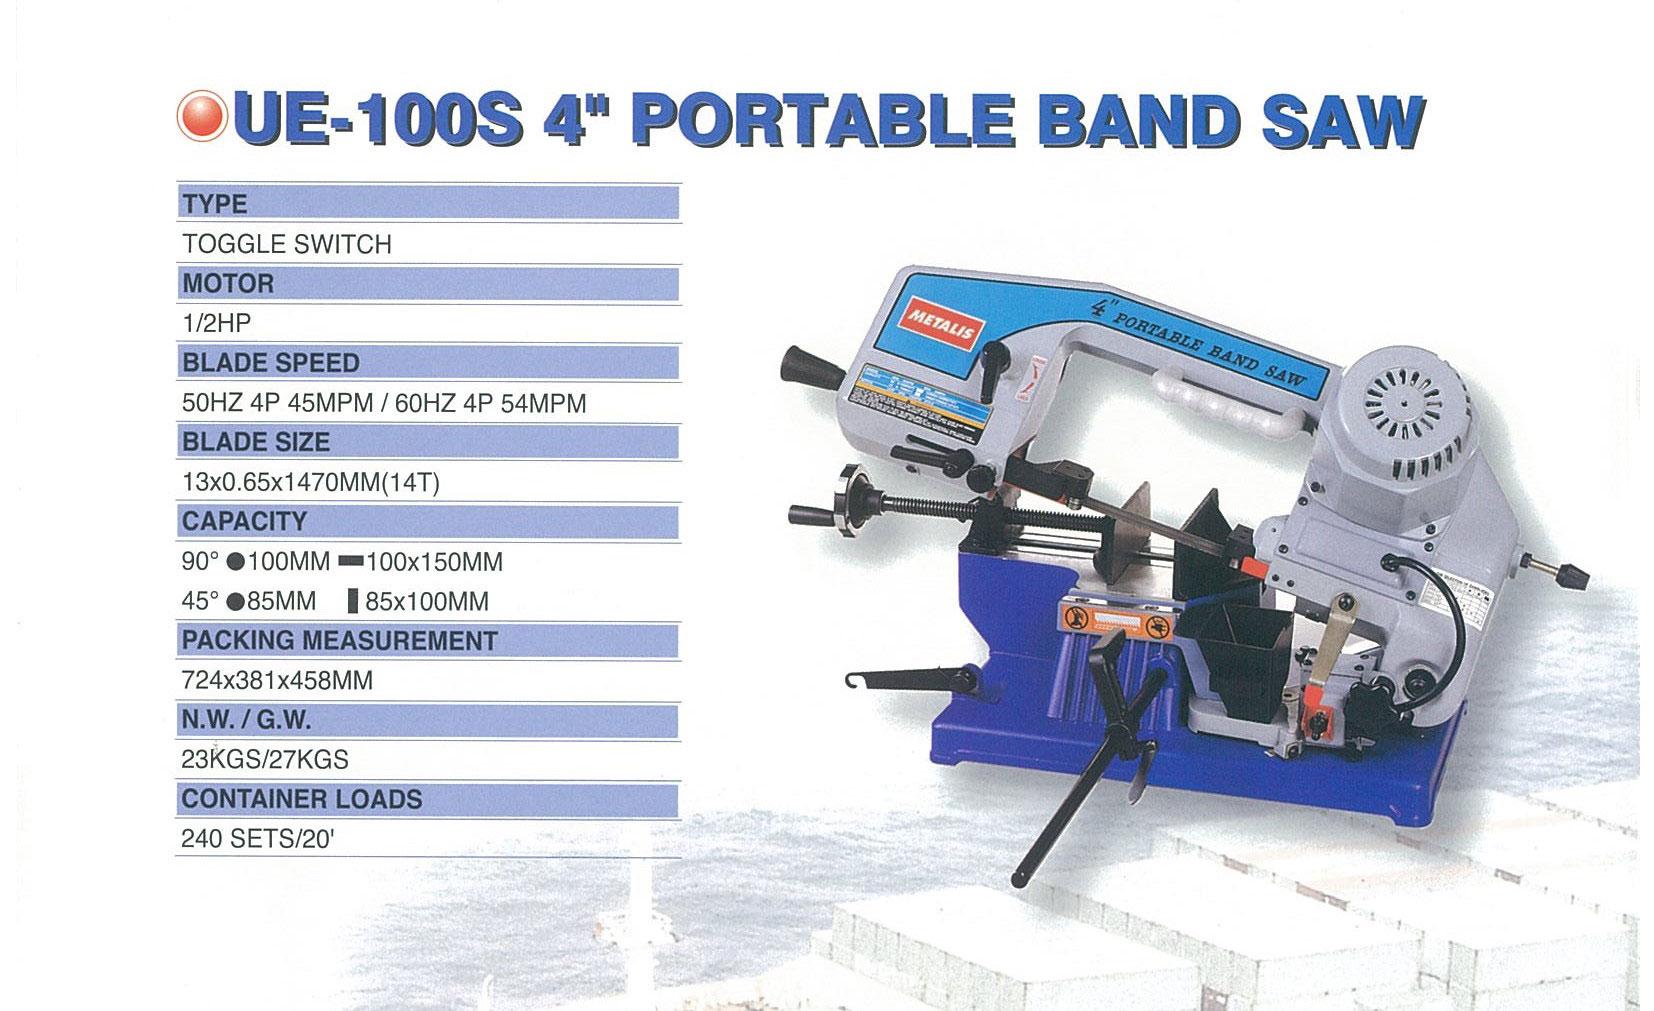 mesin portable bansaw ue-100s